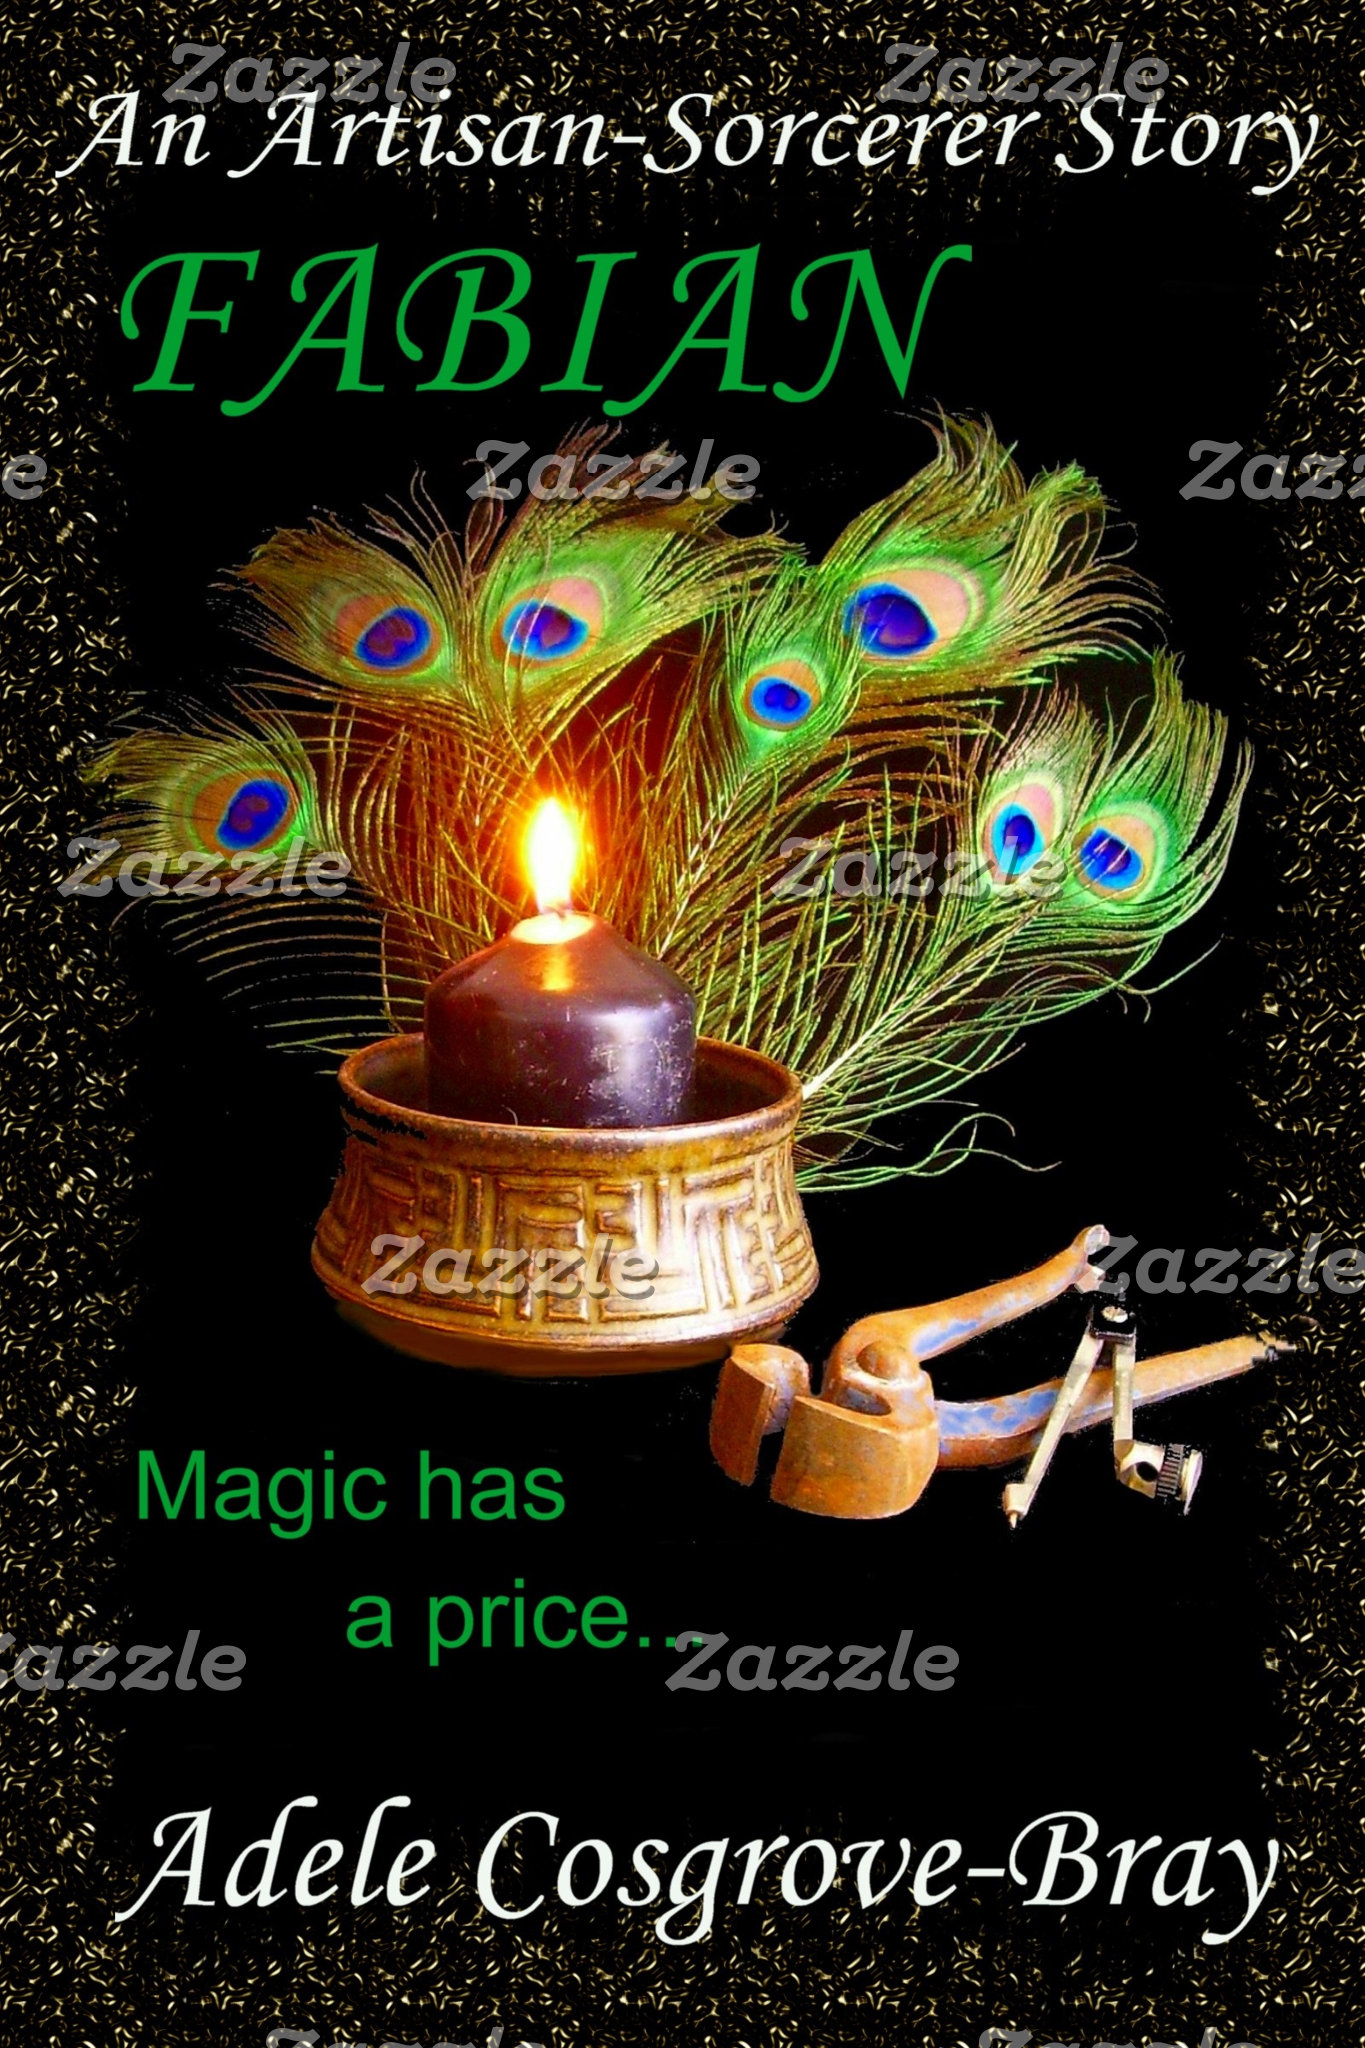 Artisan-Sorcerer Series